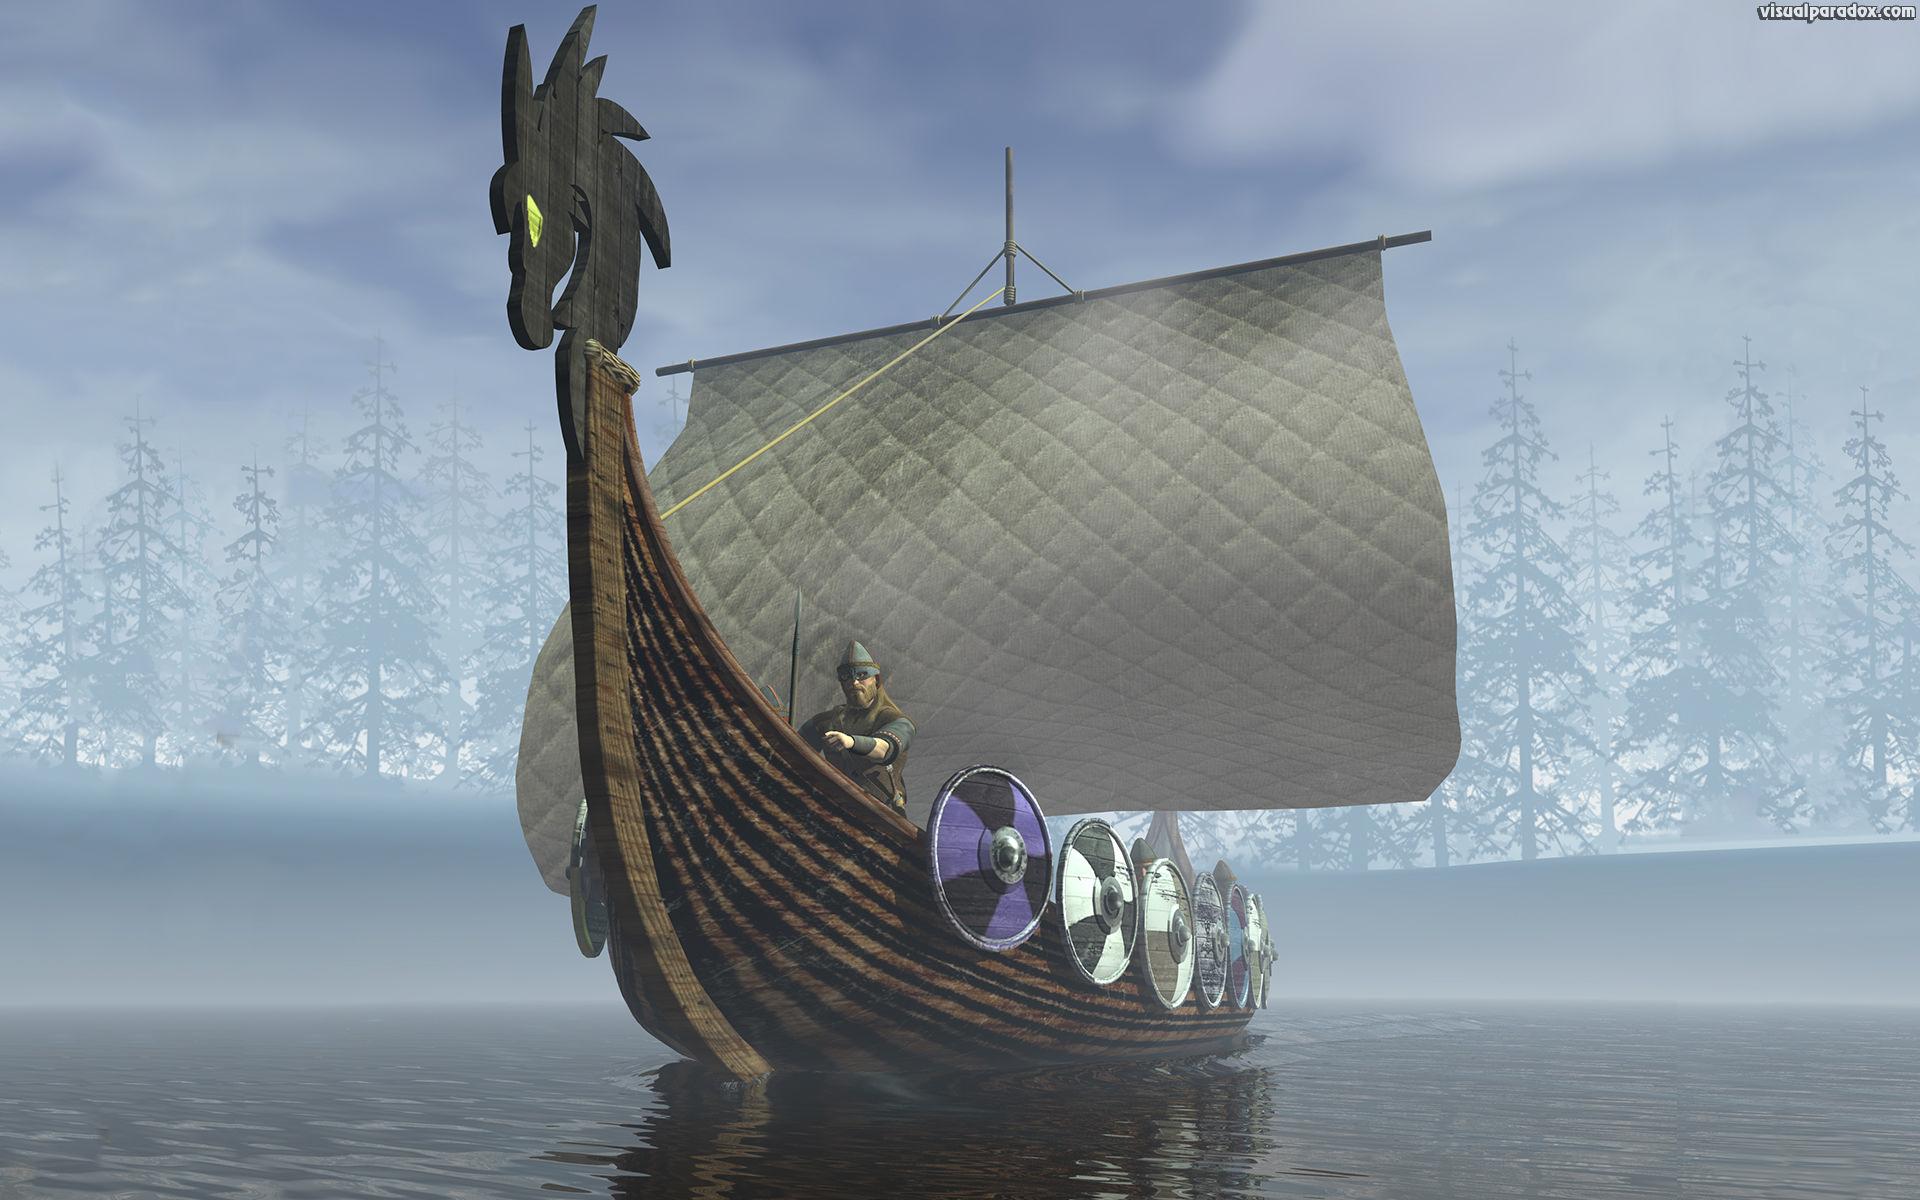 Paradox 3D Wallpaper Viking Ship 1920x1200 size wallpaper 1920x1200